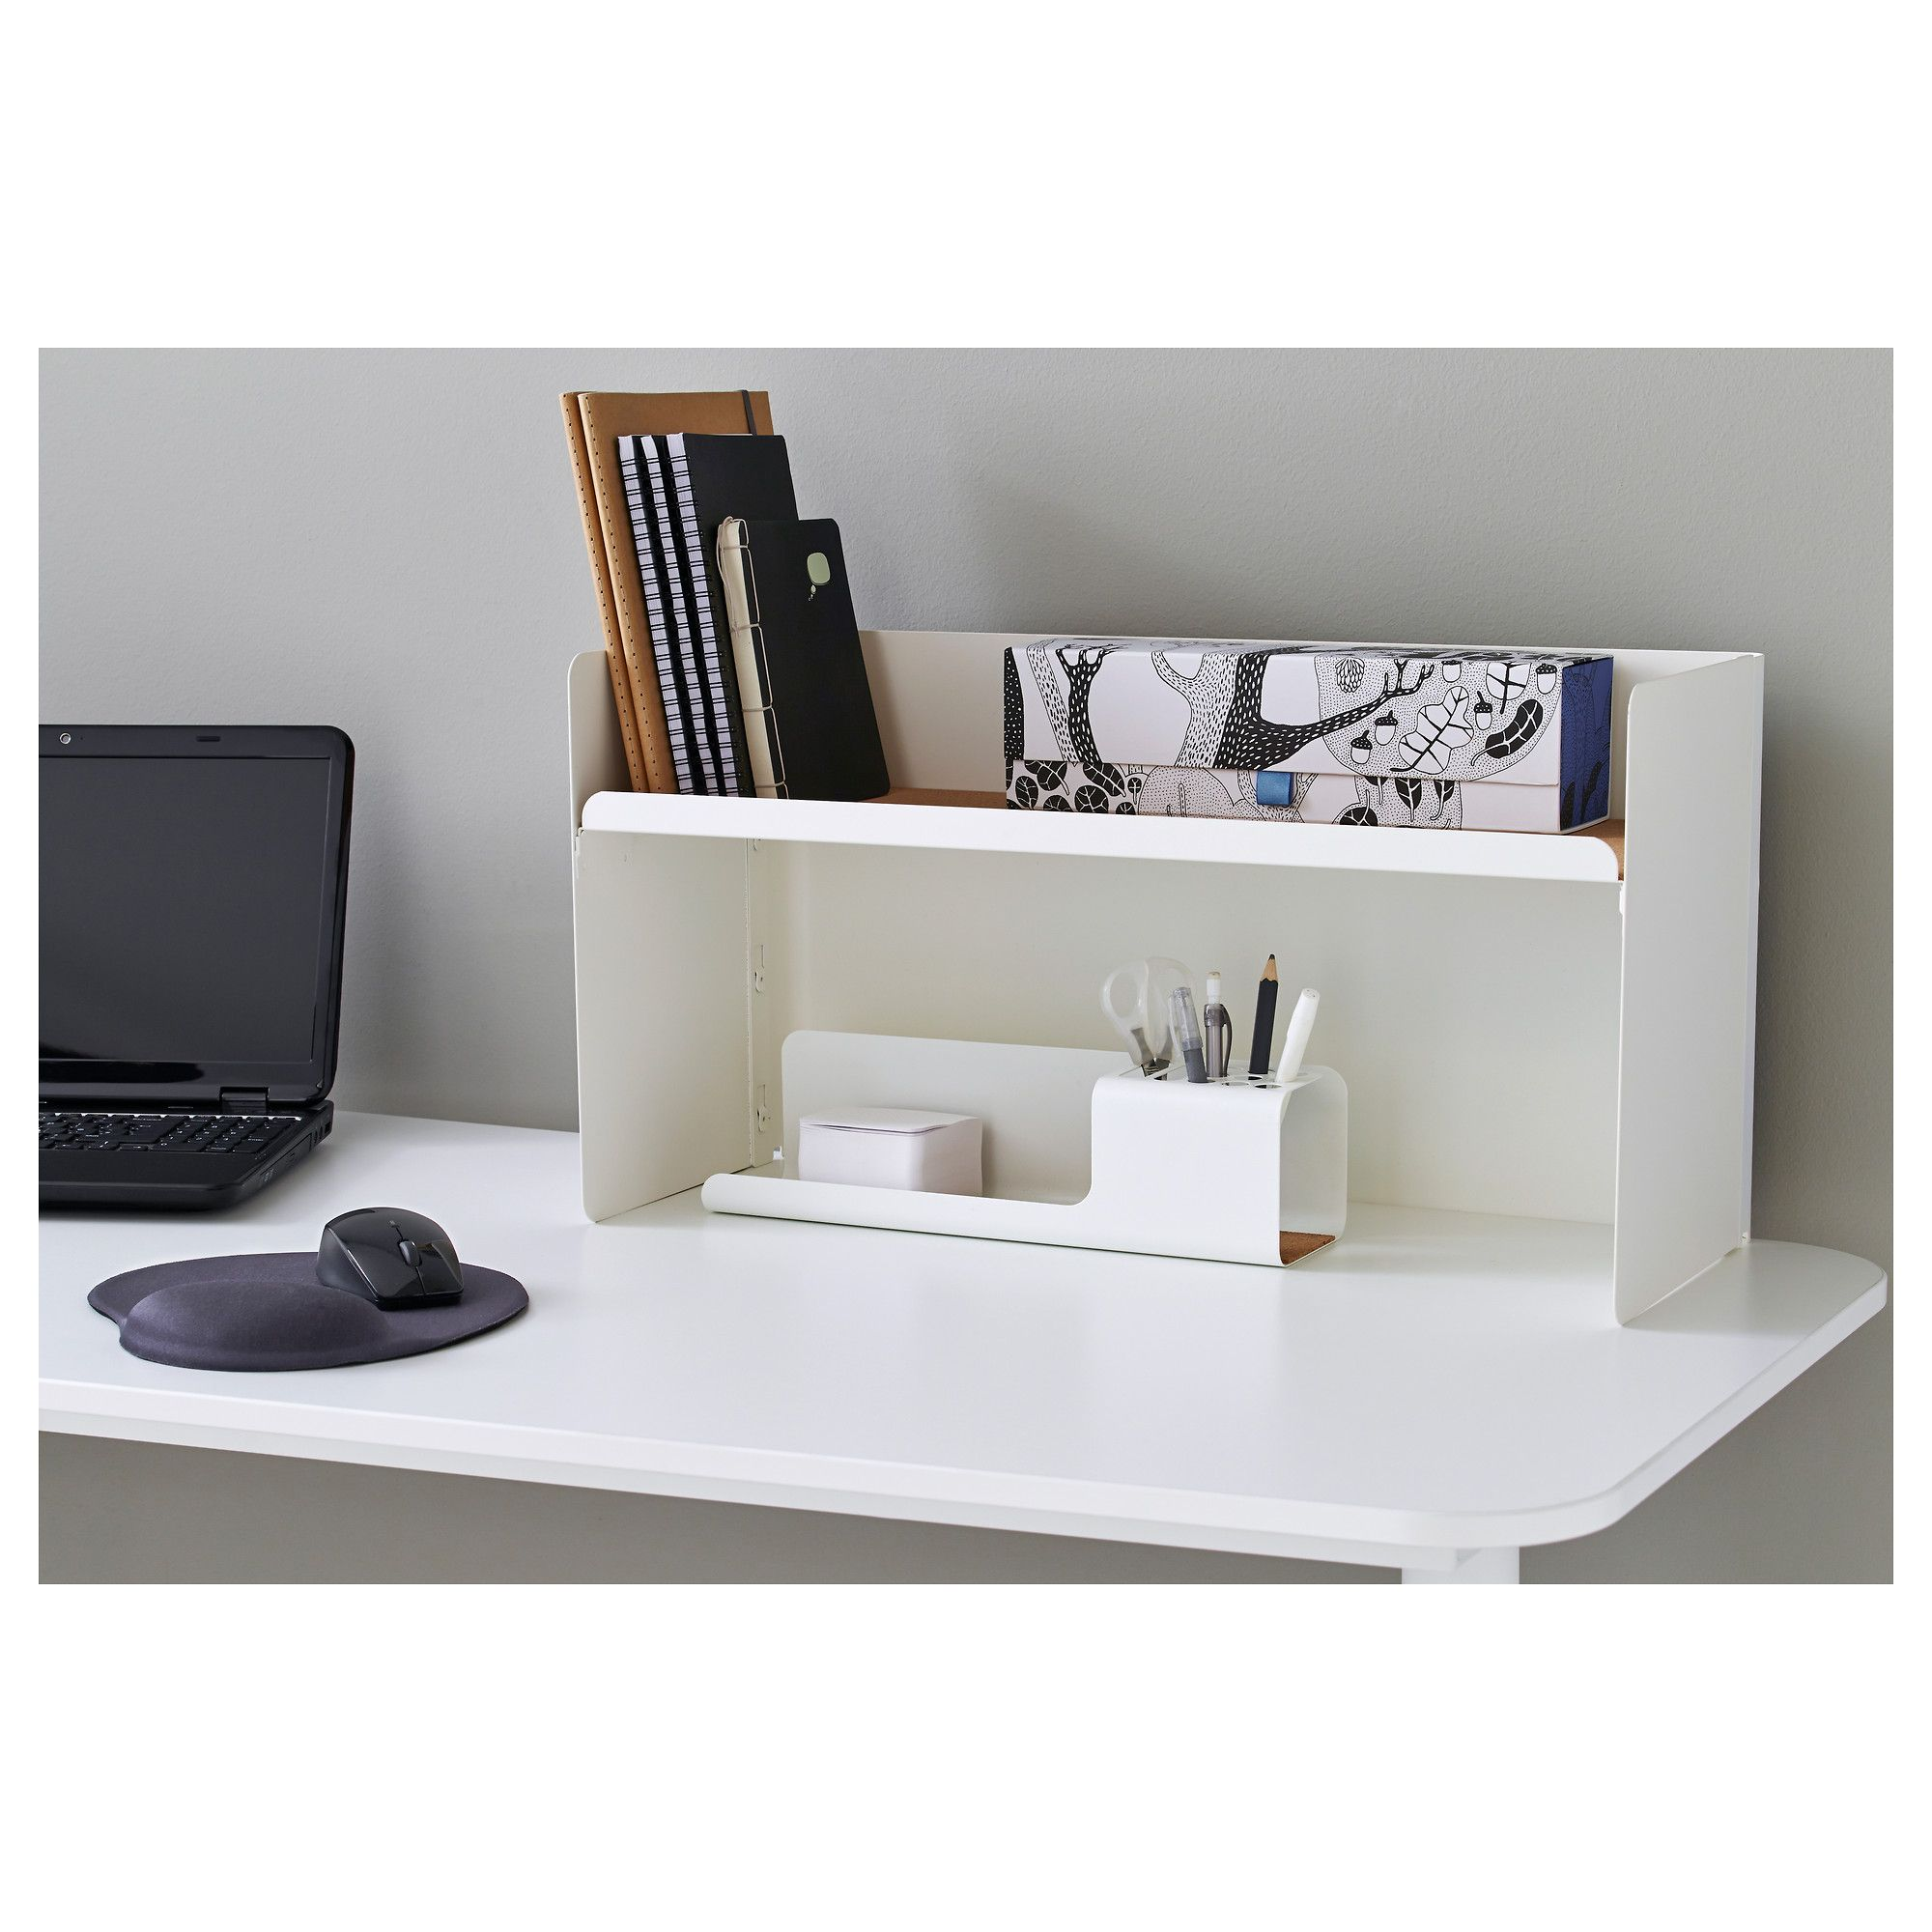 IKEA BEKANT desk top shelf